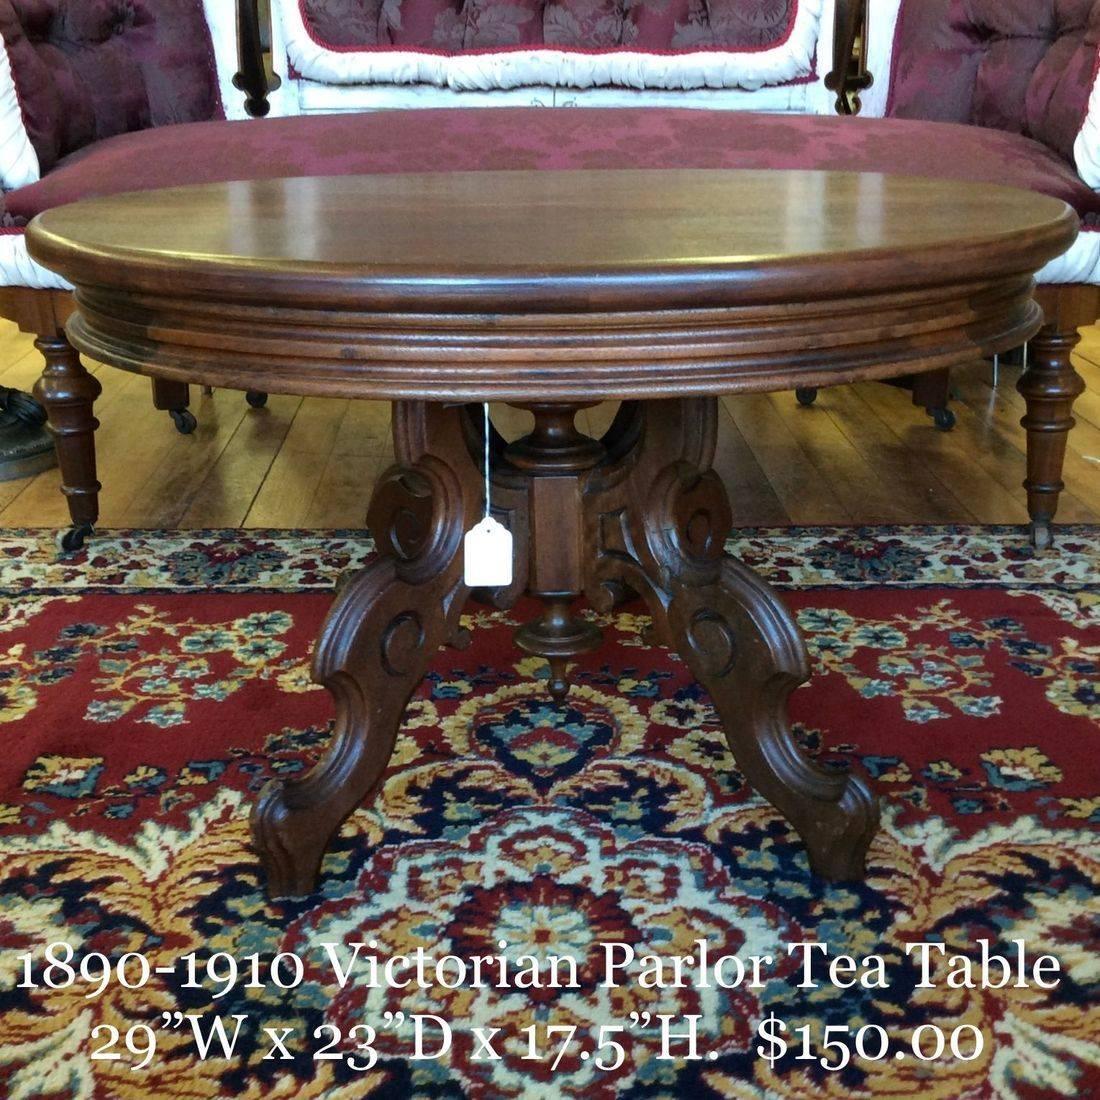 "1890-1910 Victorian Parlor Tea Table 29""L x 23""W x  17-1/2"" H.   $150.00"